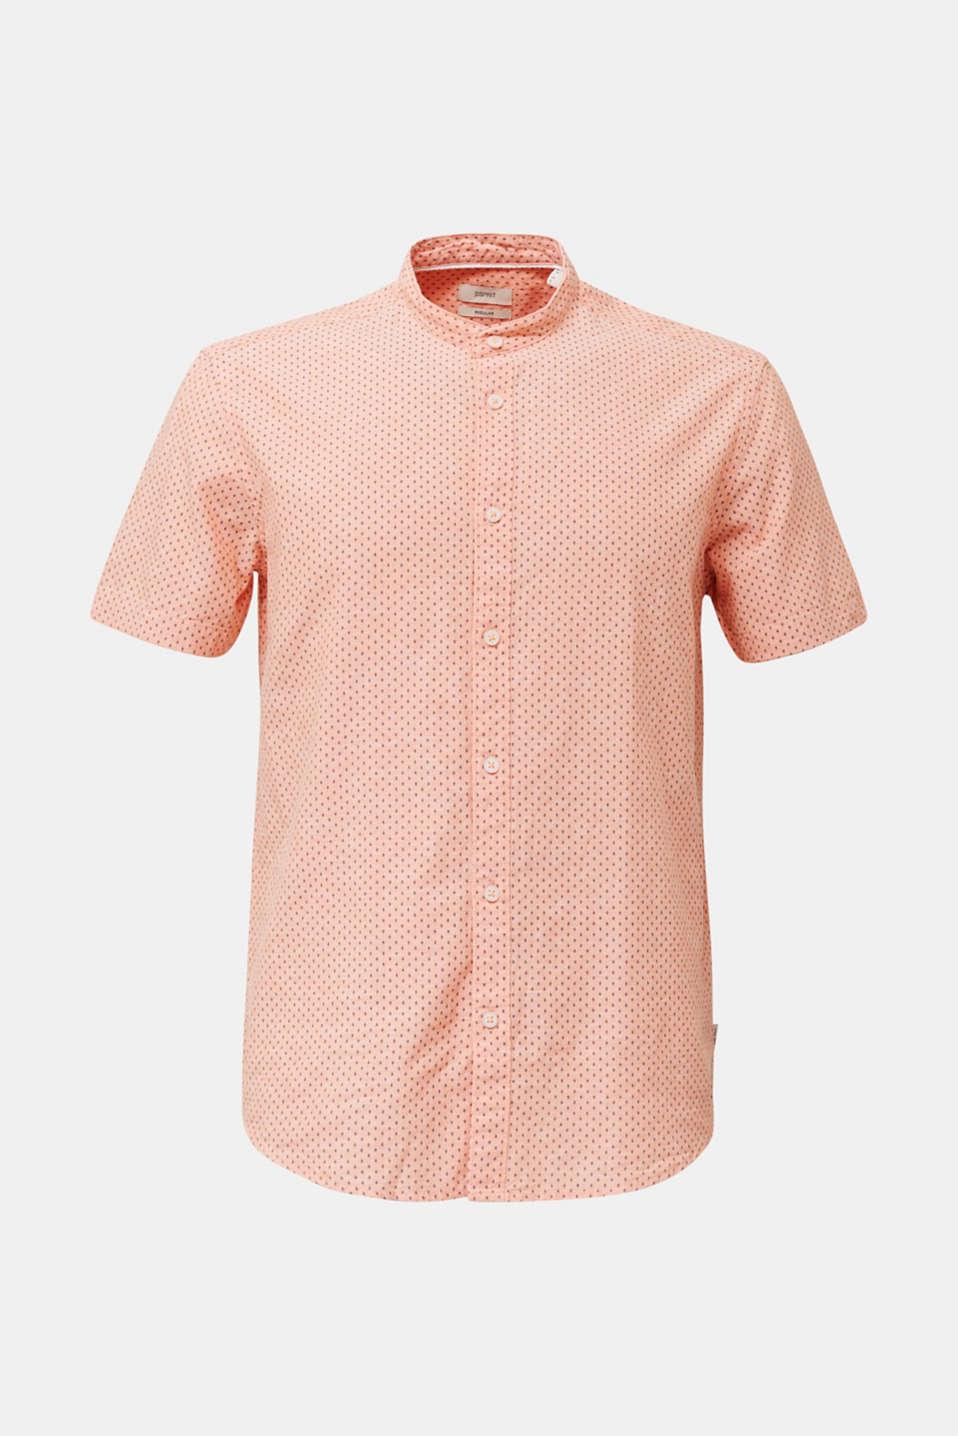 Blended linen: short sleeve shirt with band collar, ORANGE 4, detail image number 7